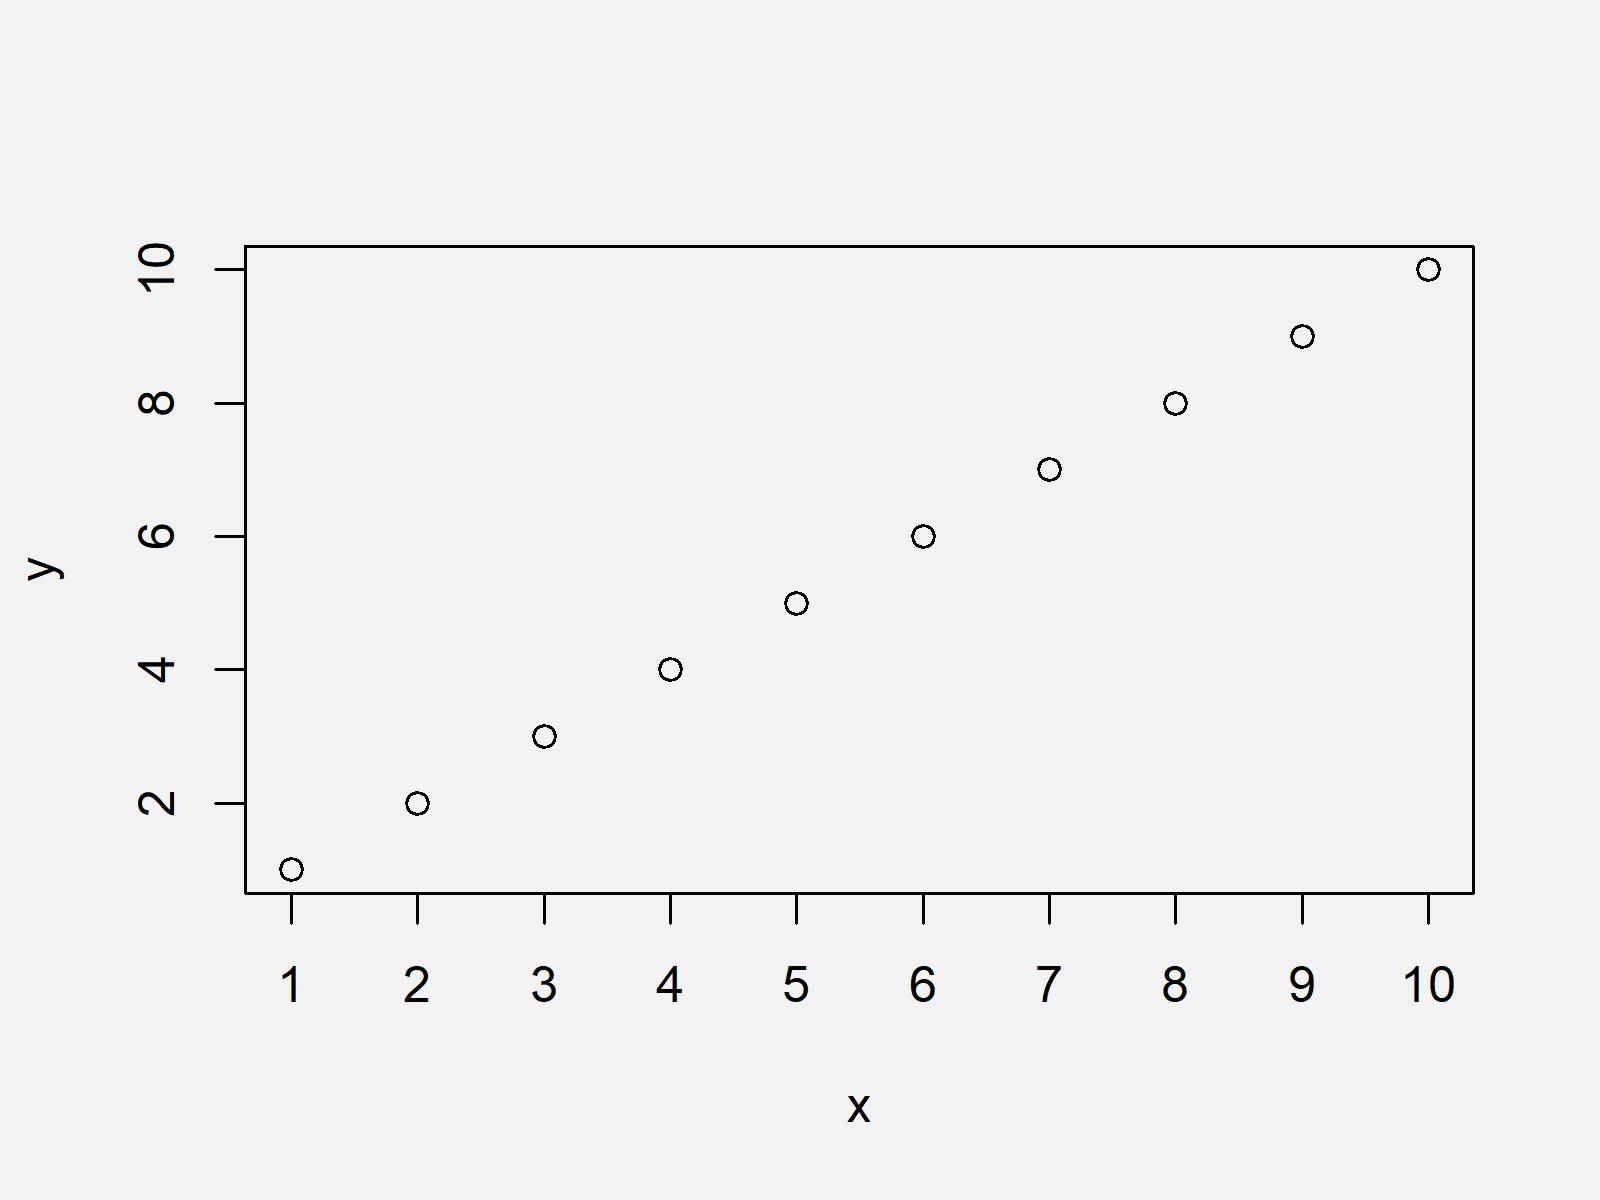 r graph figure 3 plot actual values as axis ticks r